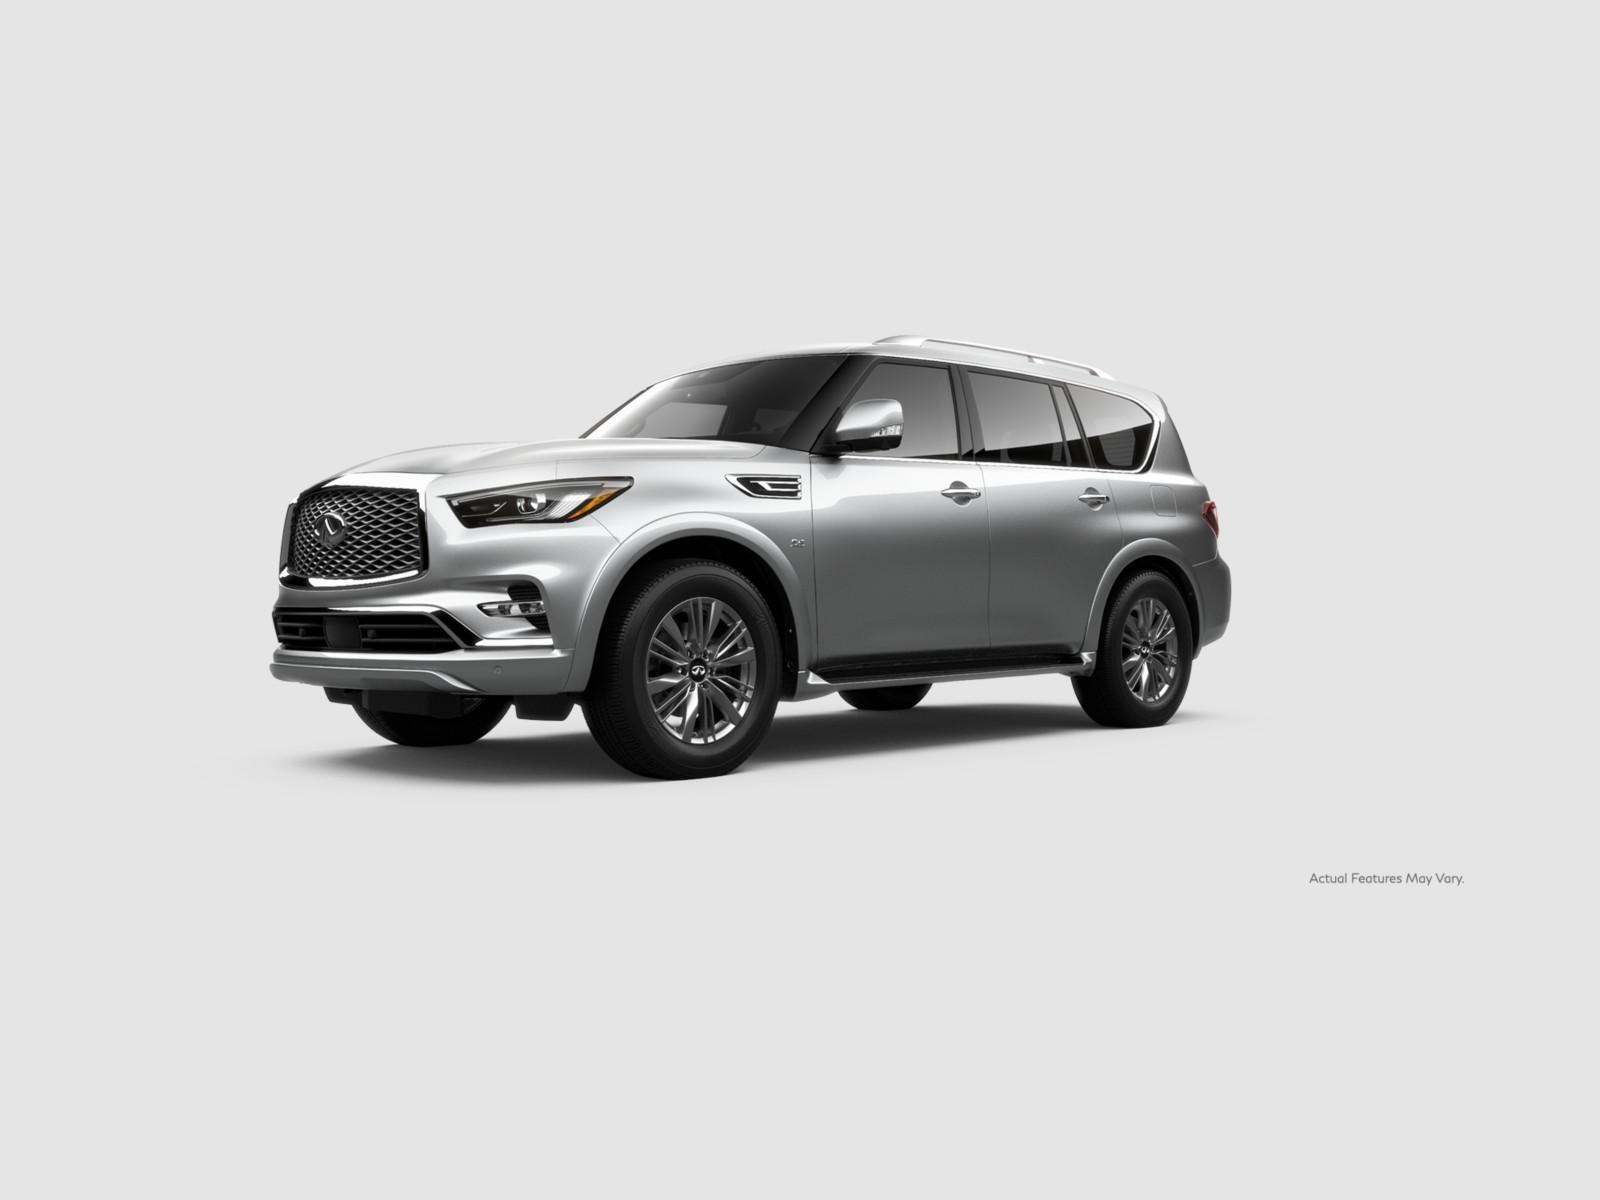 2020 INFINITI QX80 Vehicle Photo in San Antonio, TX 78230